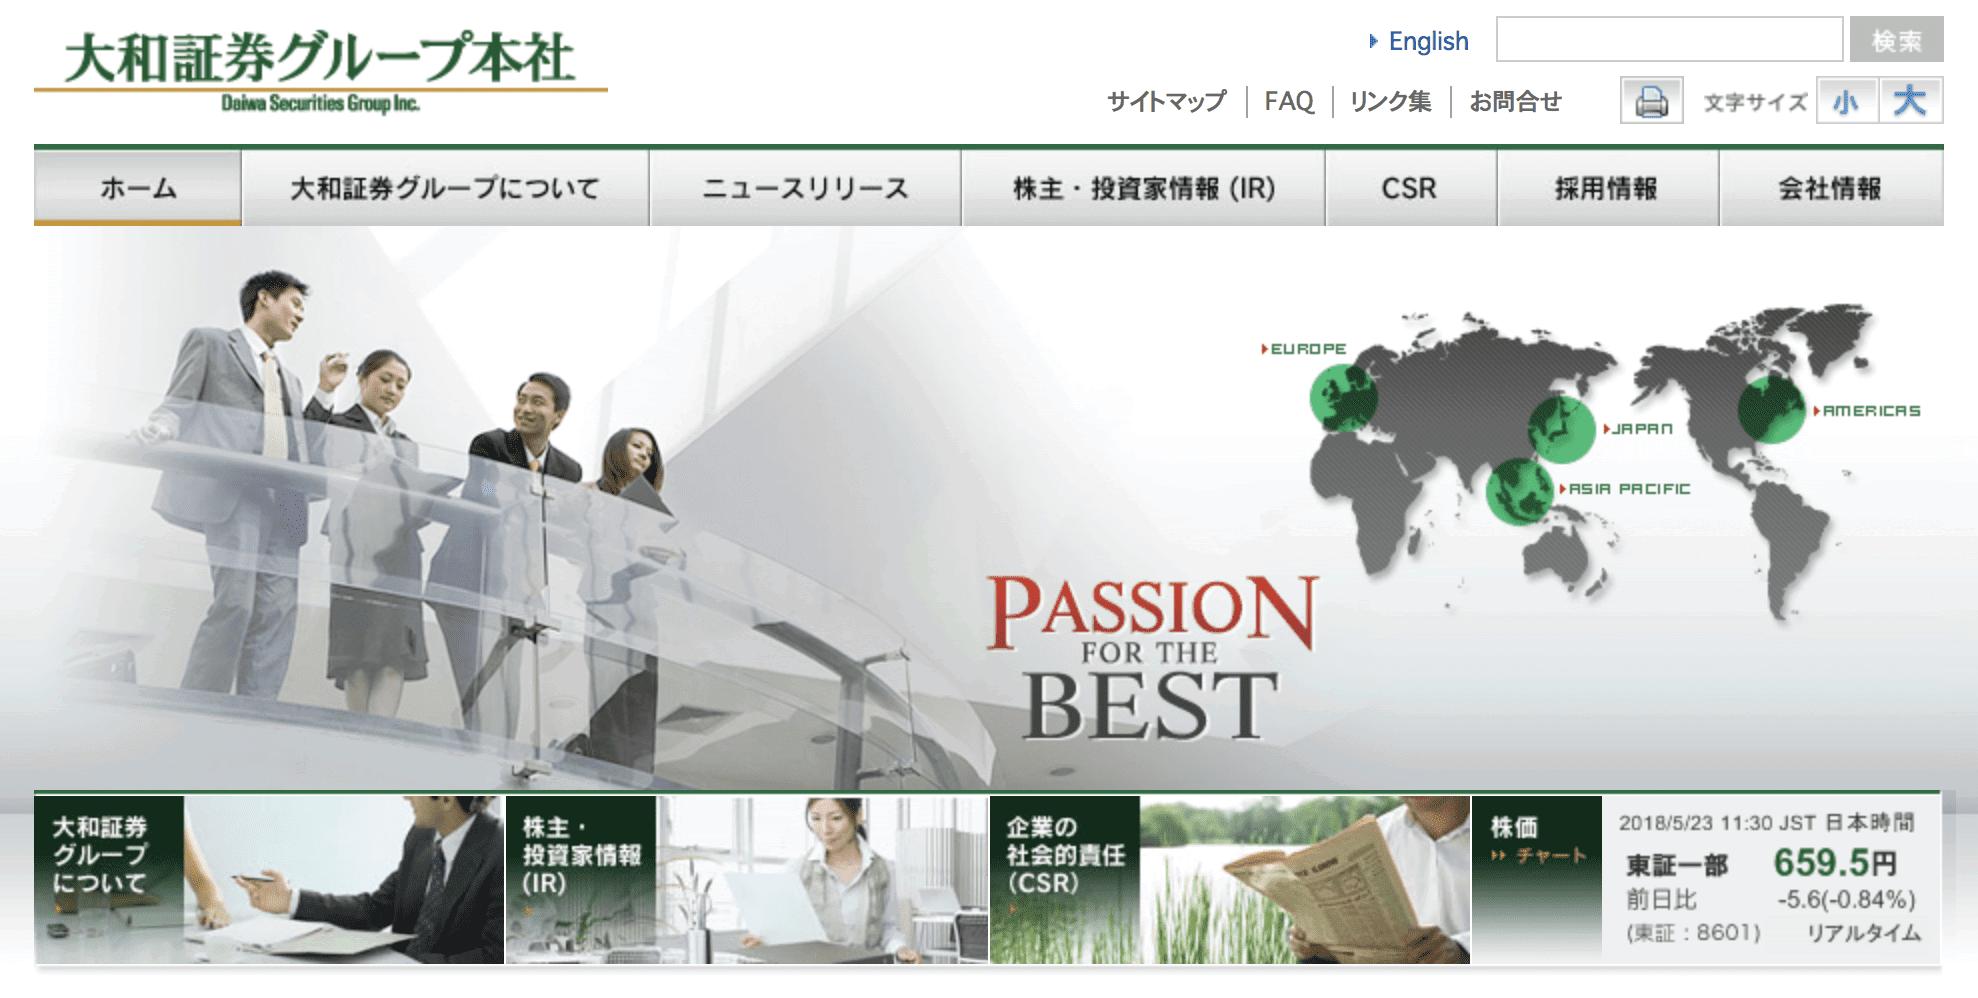 大和証券が仮想通貨事業参入を検討!